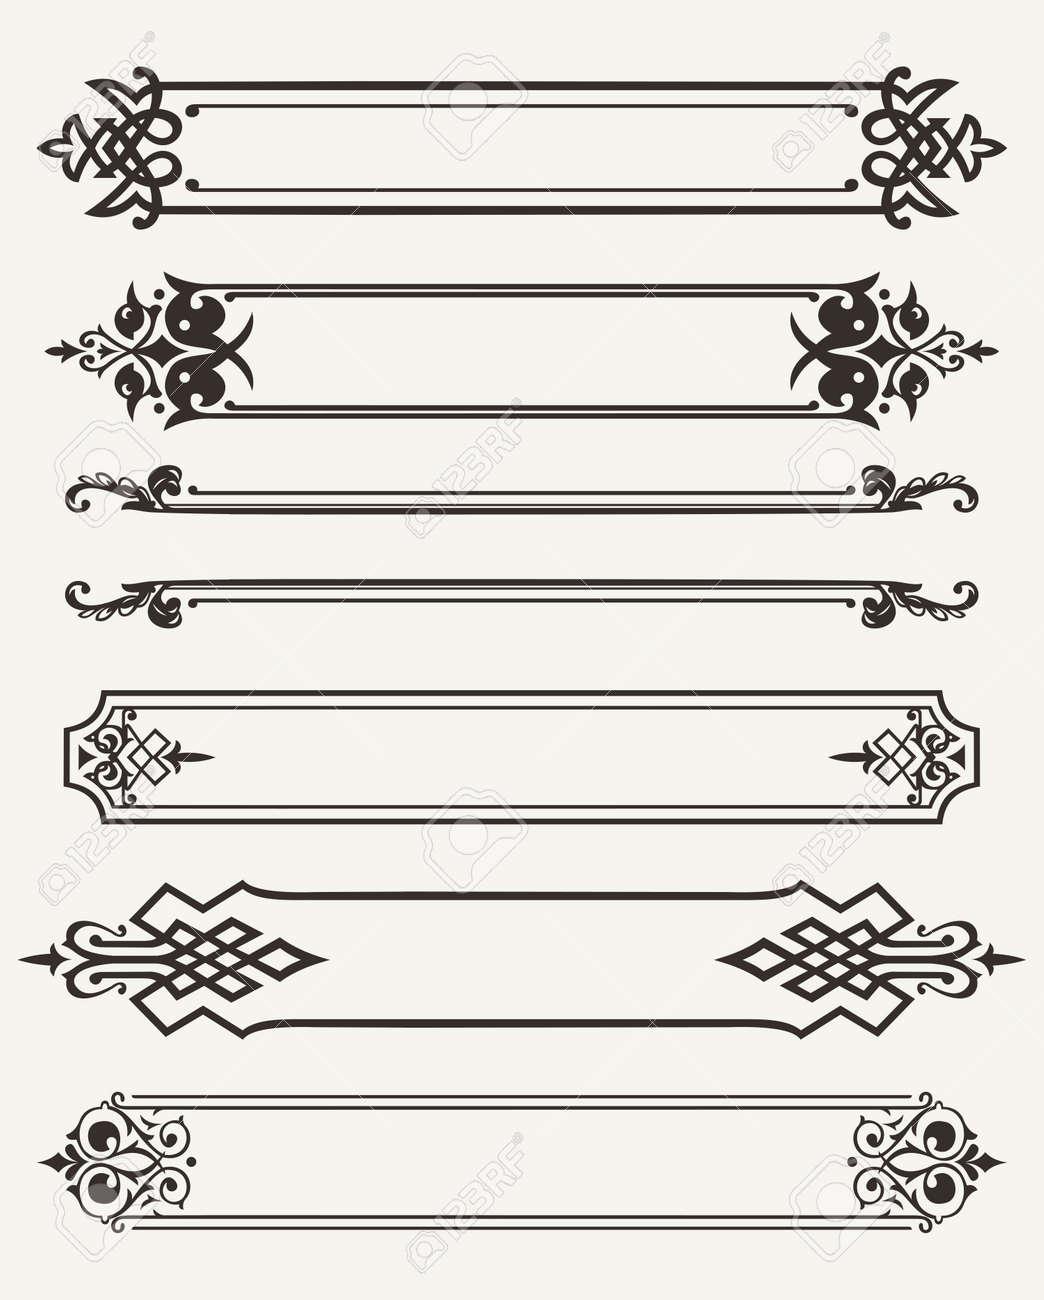 Set Of Retro Antique Frames Engraving Royalty Free Cliparts, Vectors ...